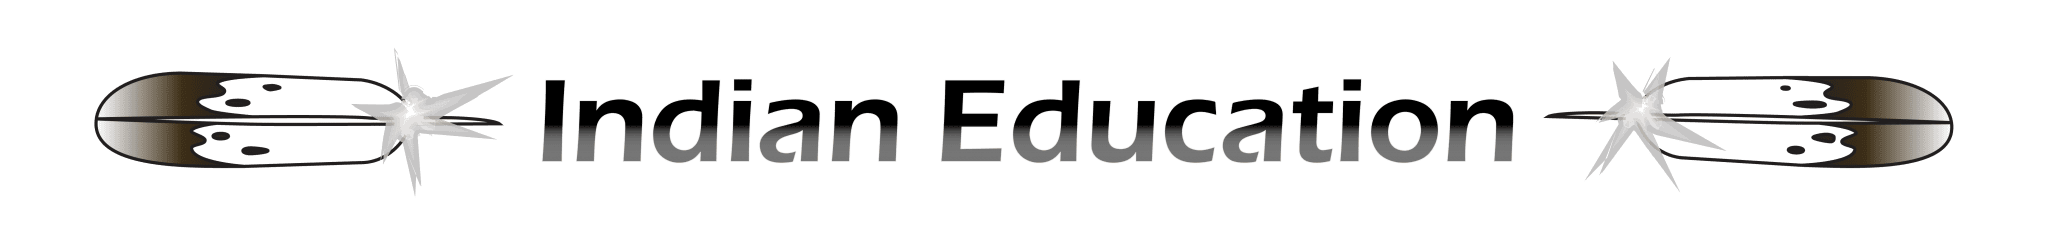 Indian Education Header